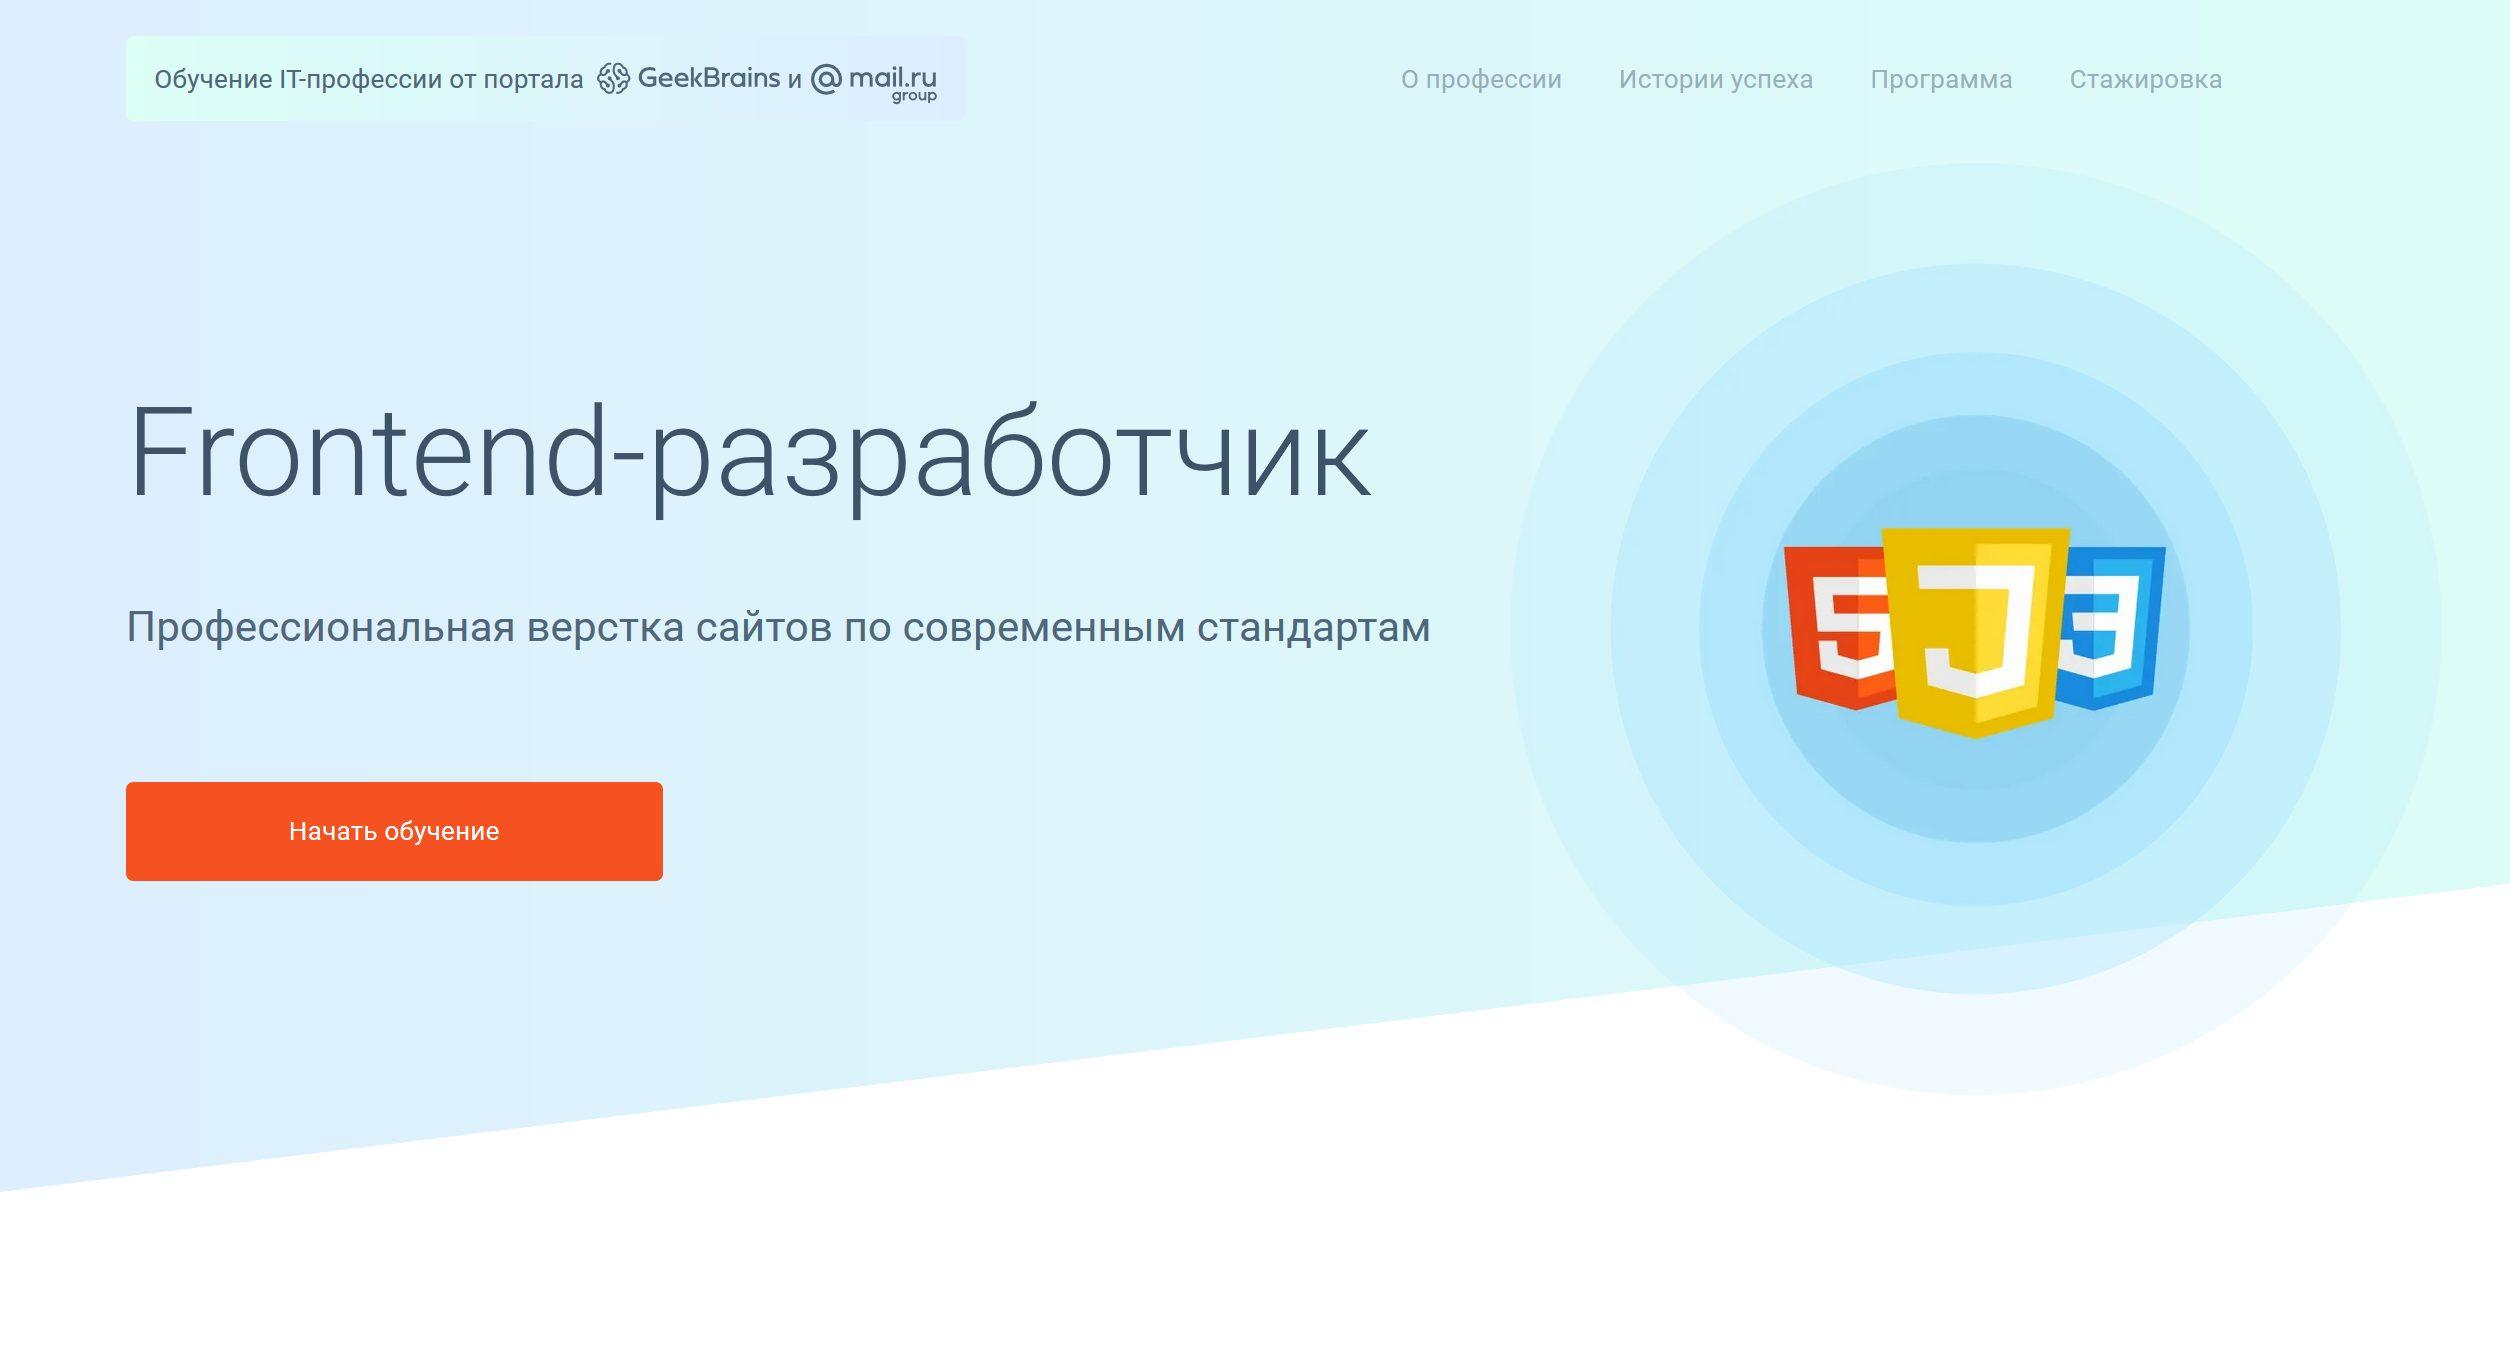 Frontend-разработчик обучение с нуля, курсы фронтенд разработчика GeekBrains - образовательный портал GeekBrains - образовательный портал